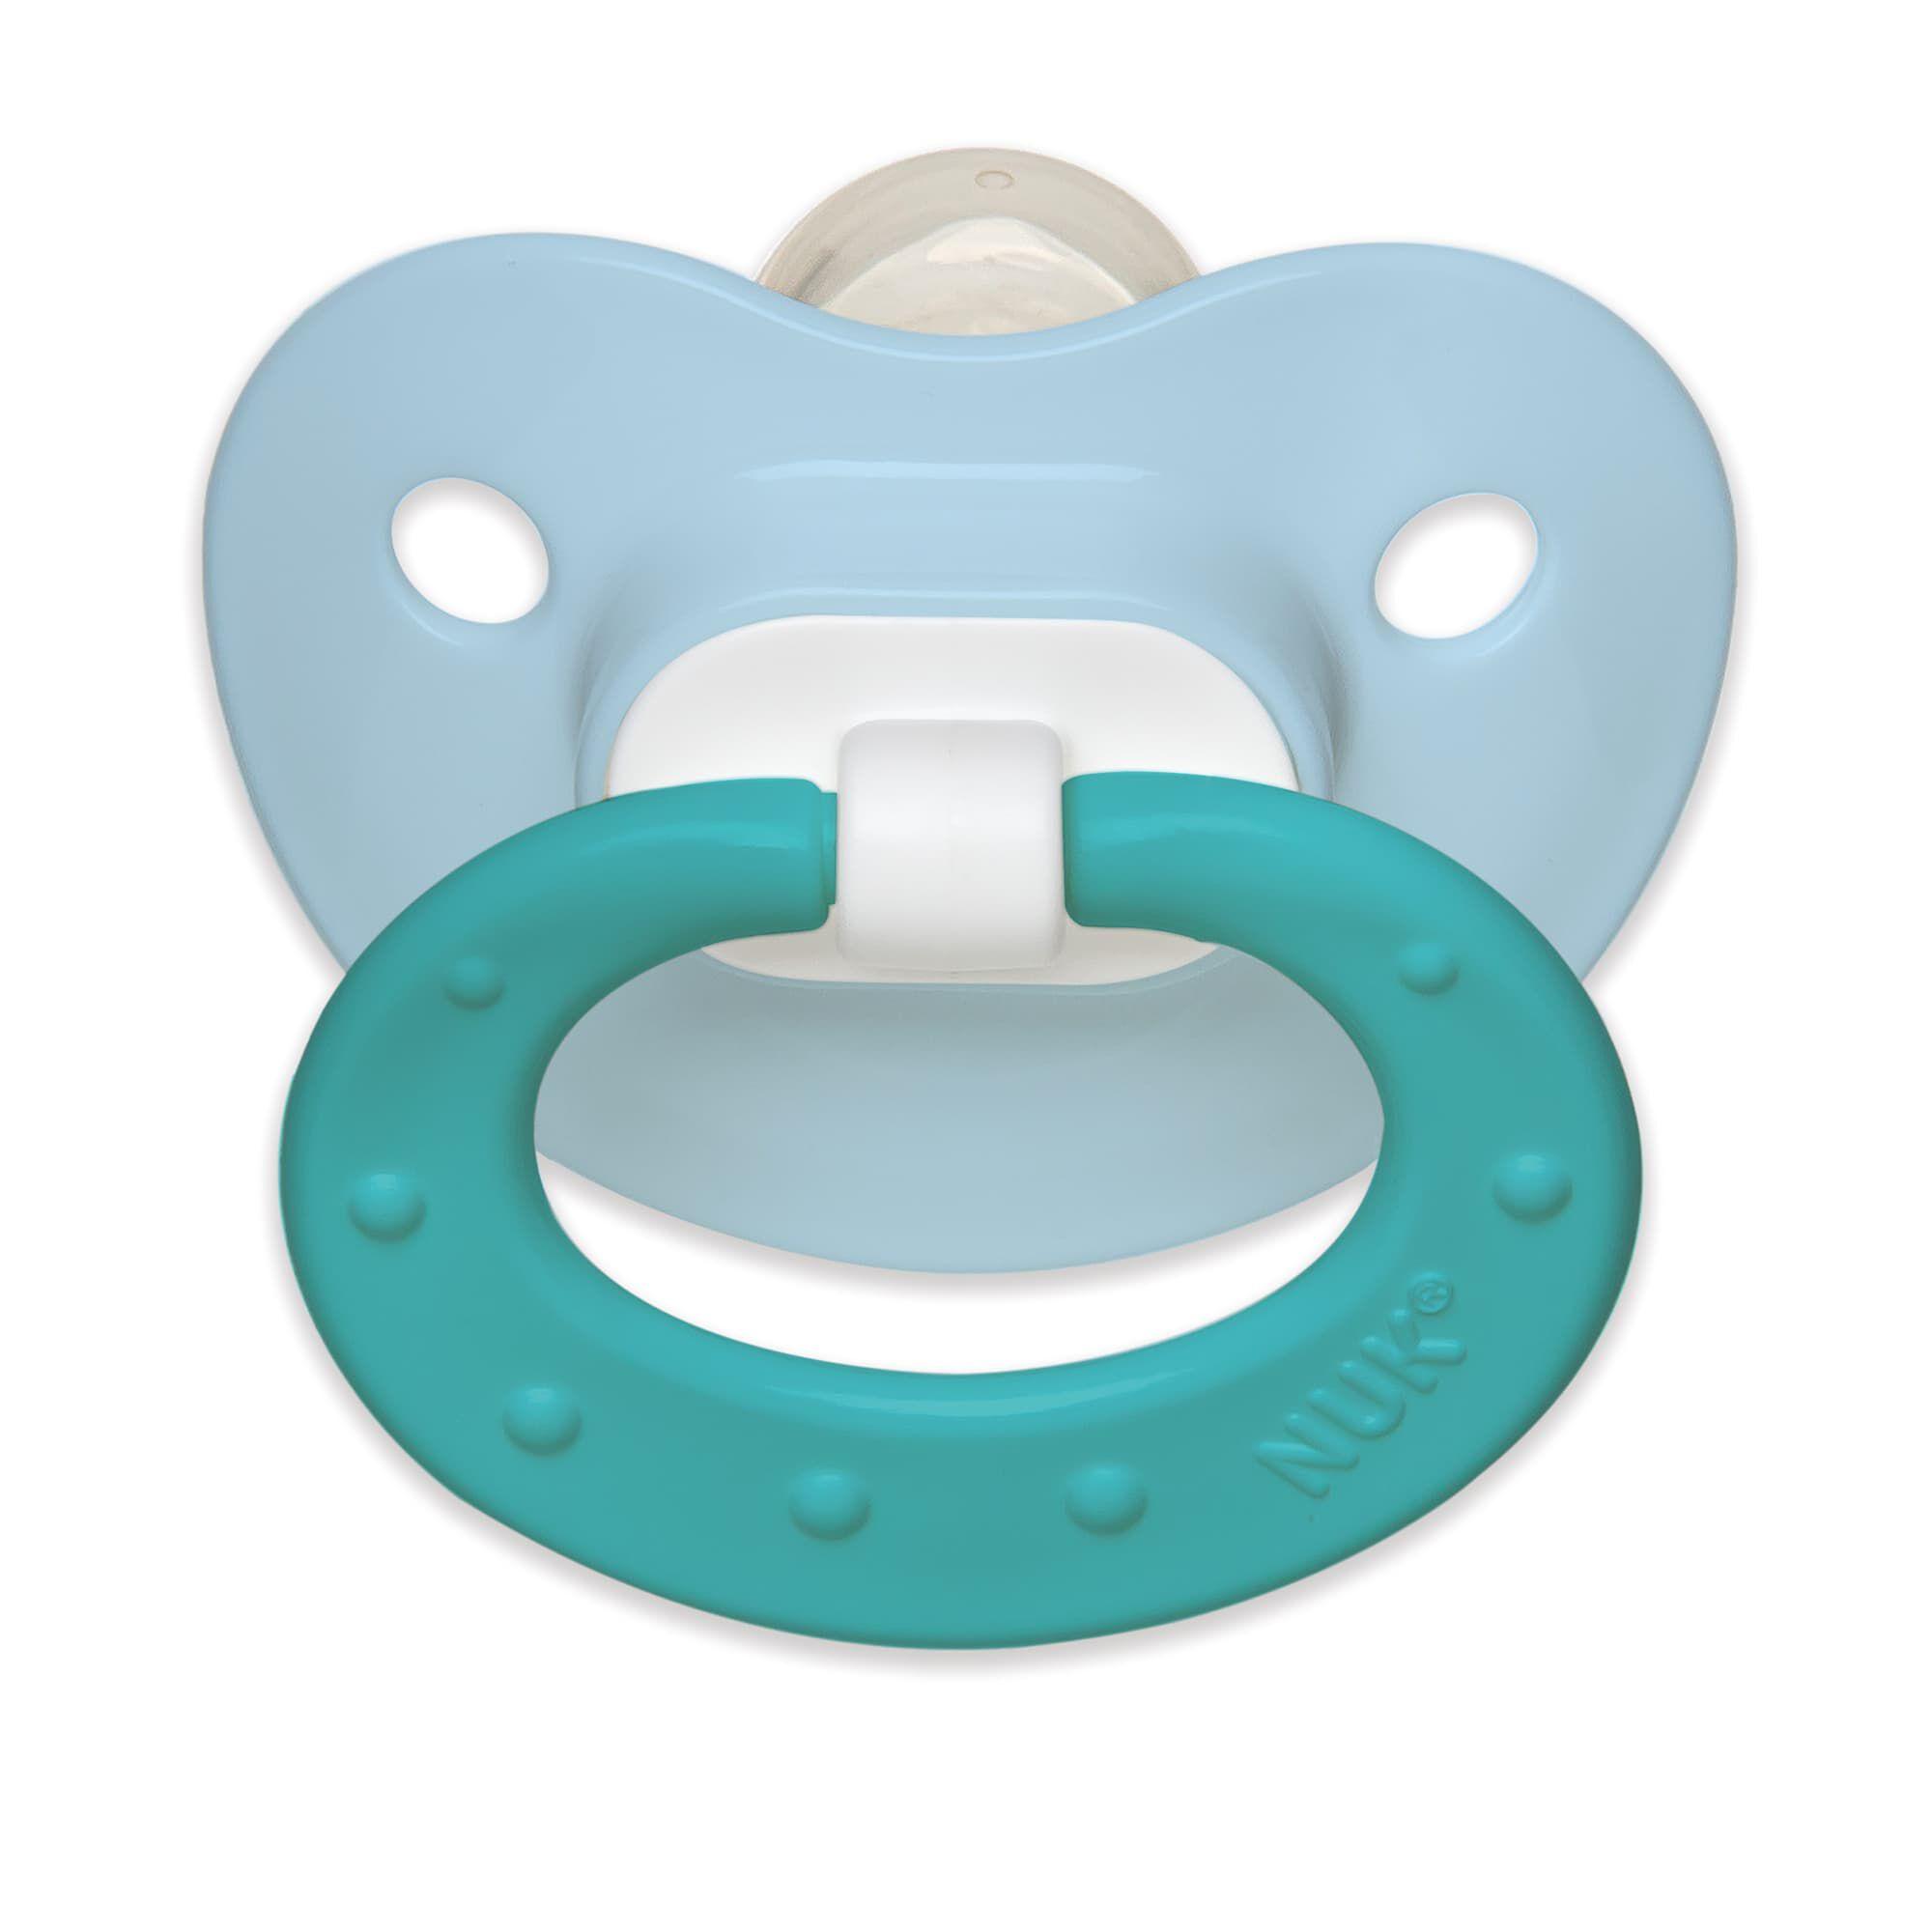 Juicy Orthodontic Pacifier Boy 0-6 Months, 2 Pack ...